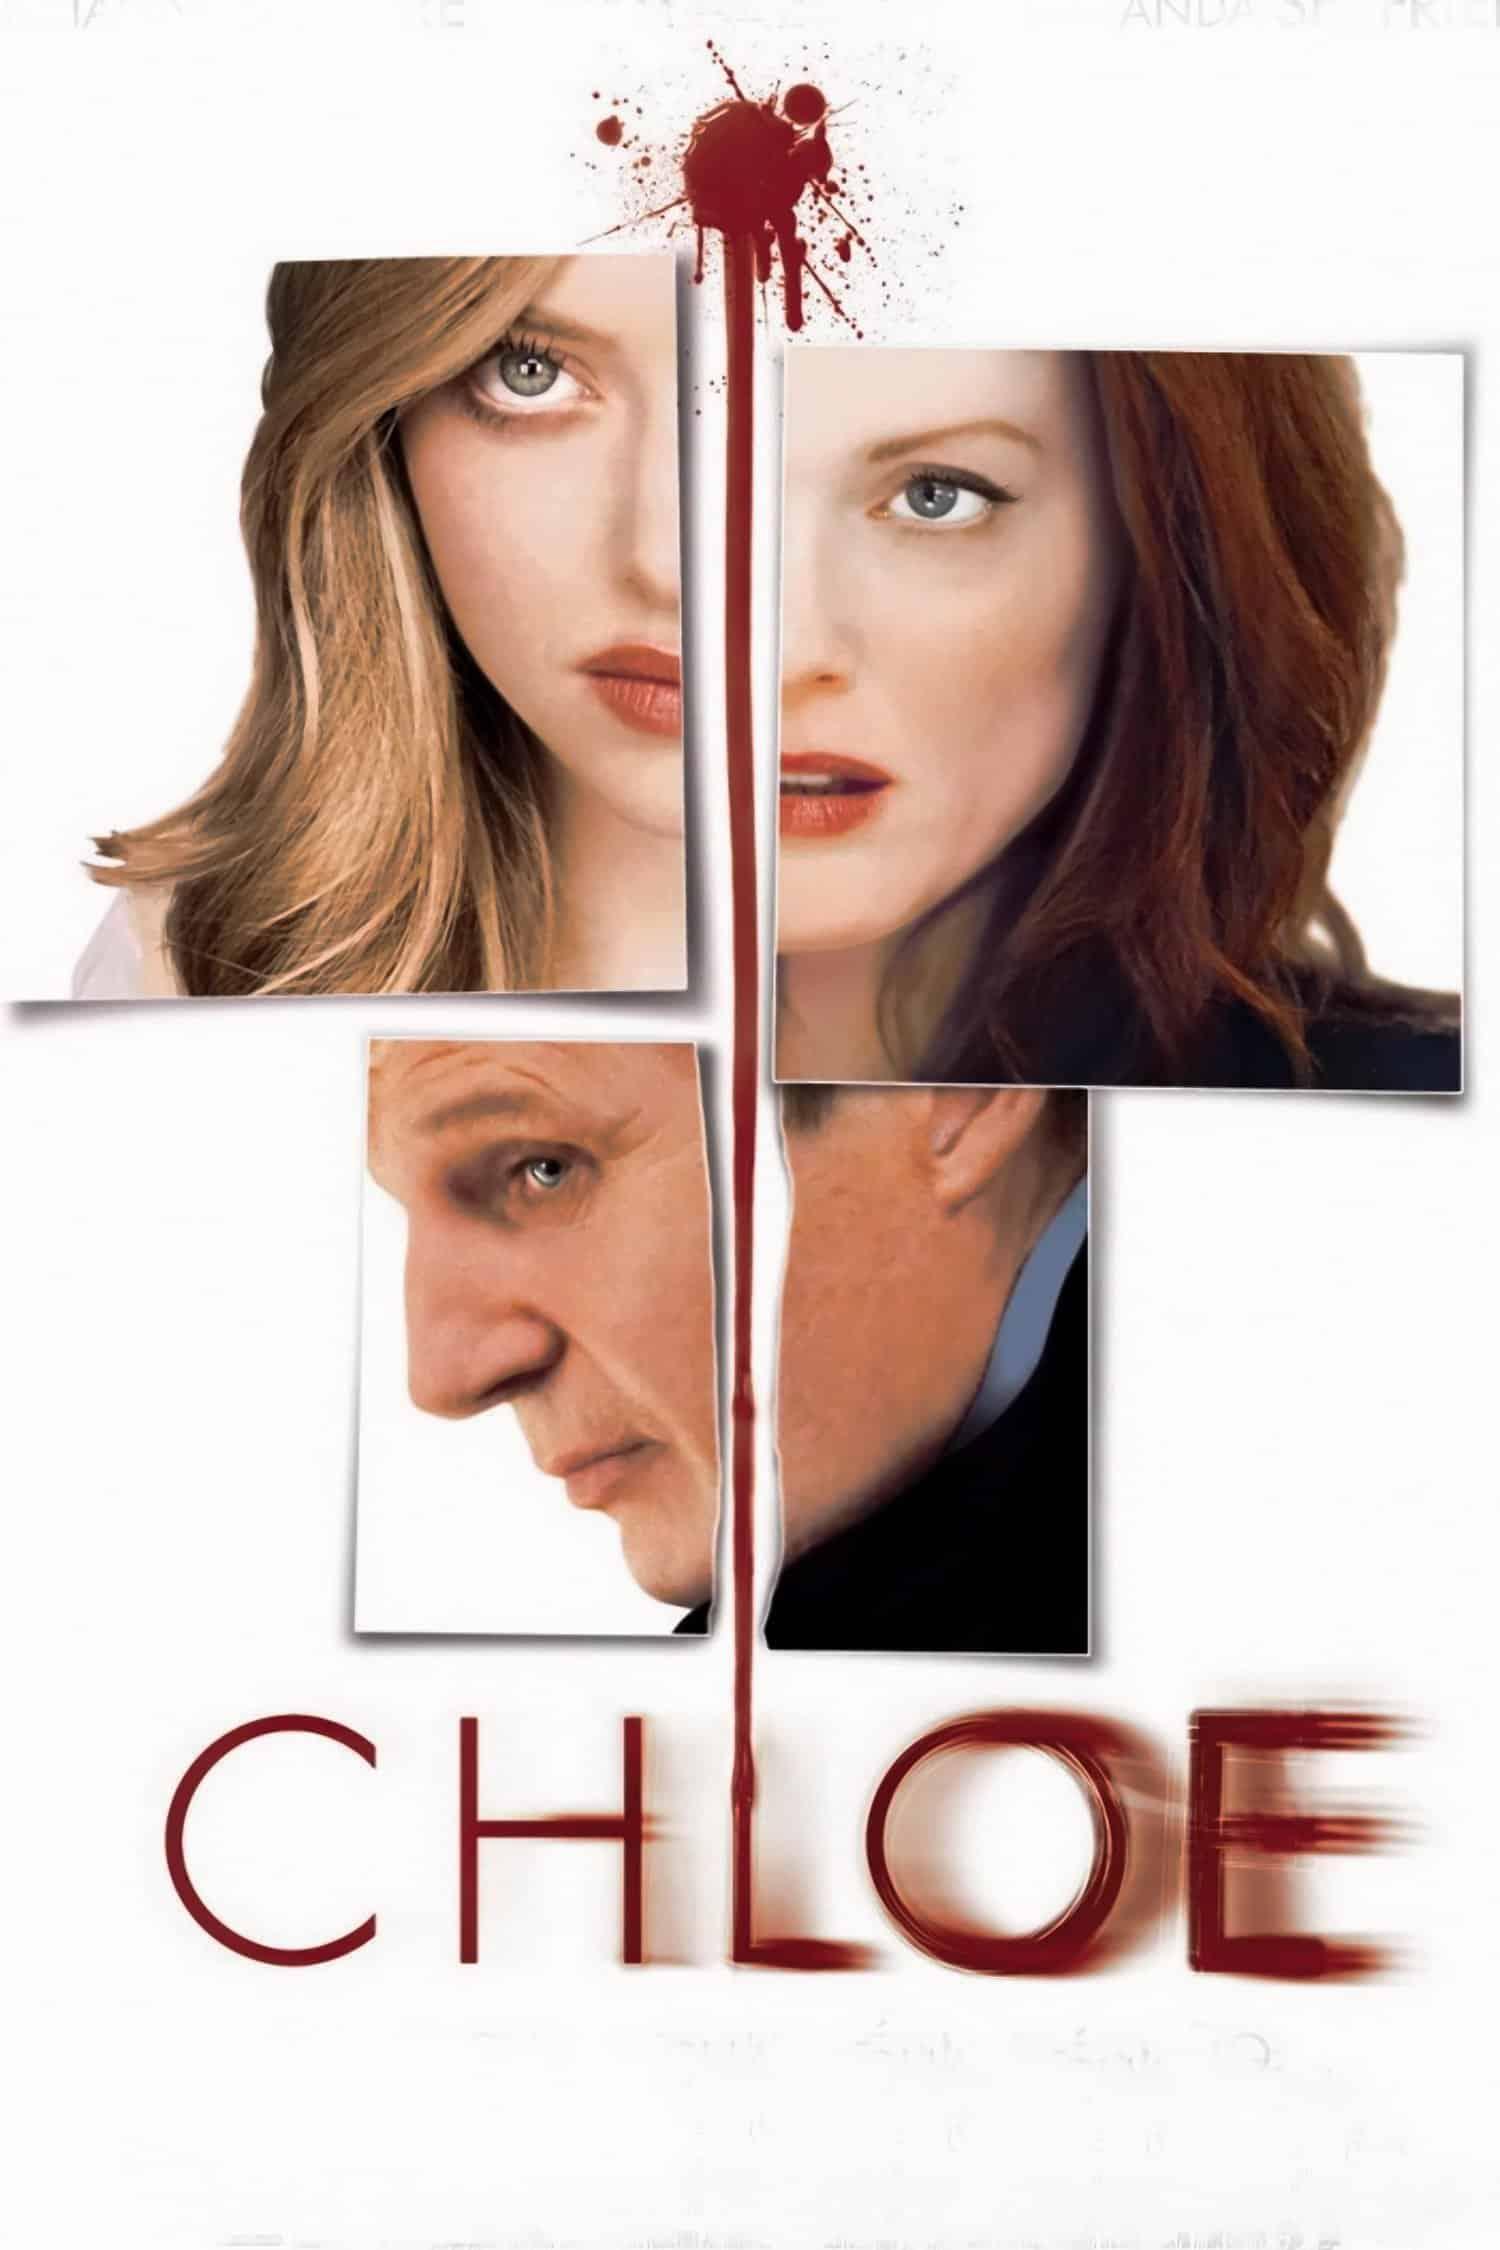 Chloe, 2009